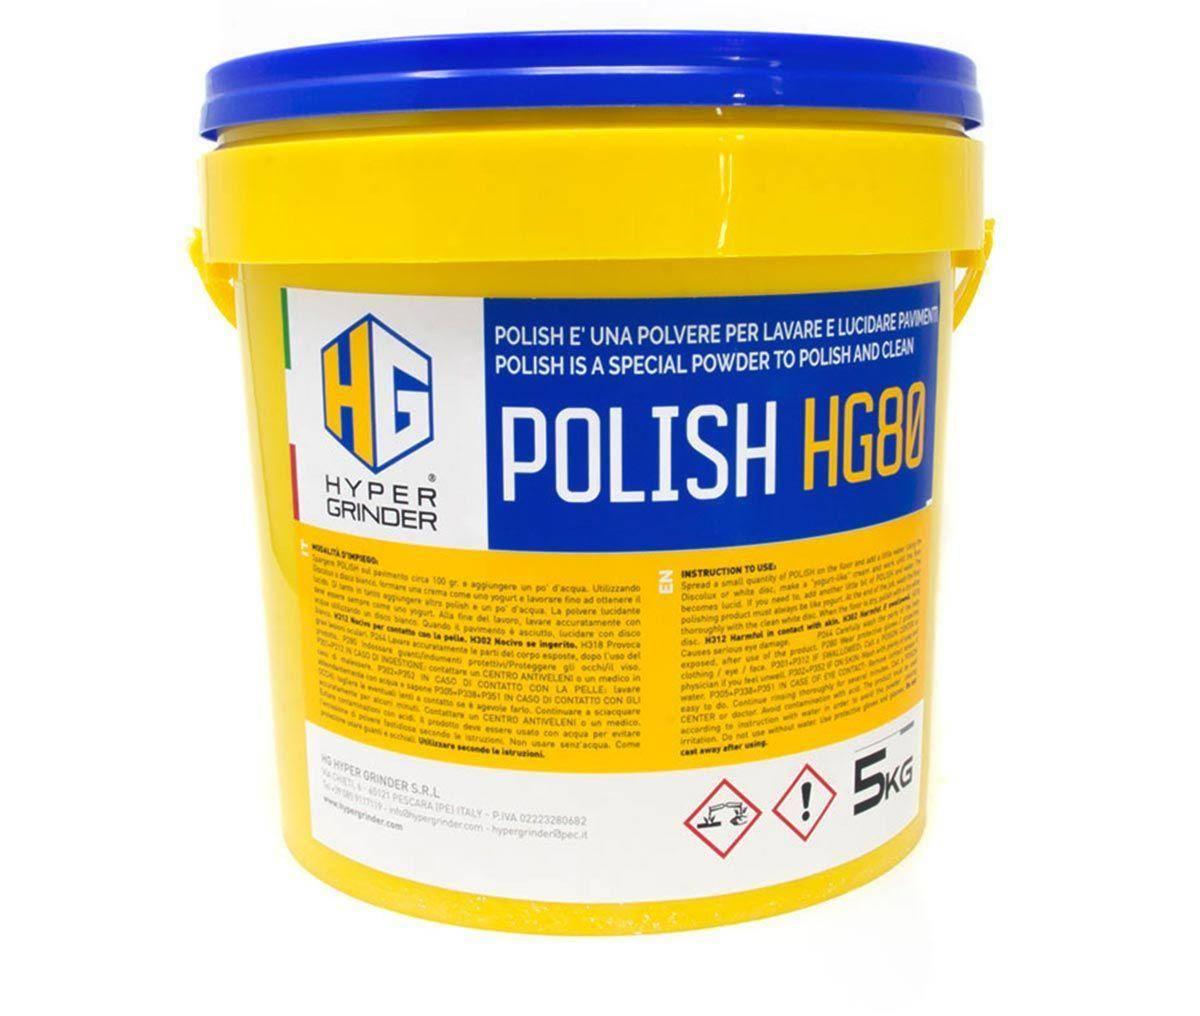 PolishHG80 1625